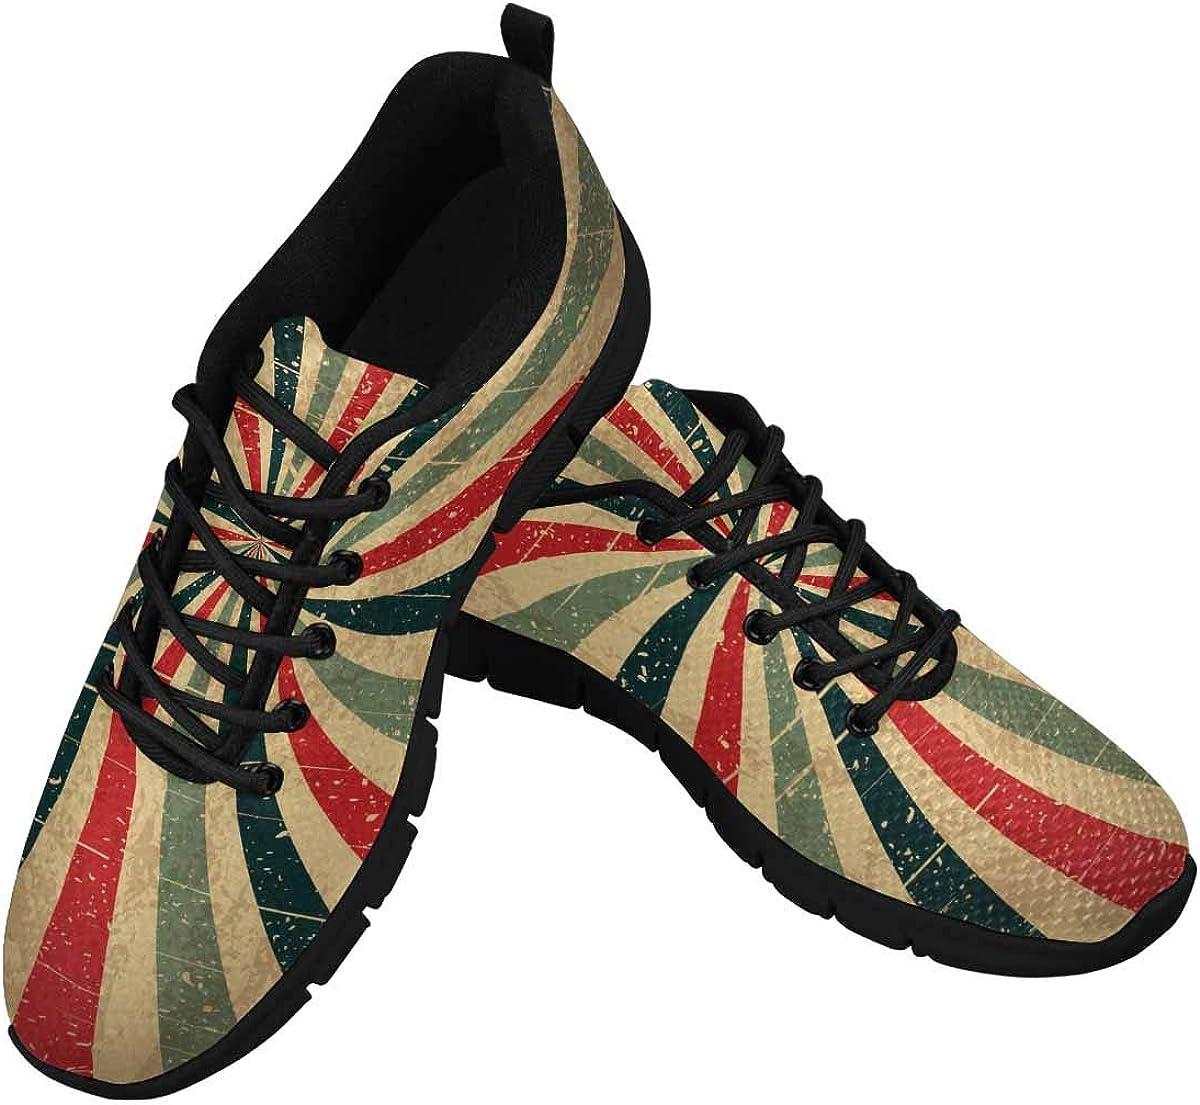 INTERESTPRINT Retro Grunge Women's Sneaker Lace Up Running Comfort Sports Shoes